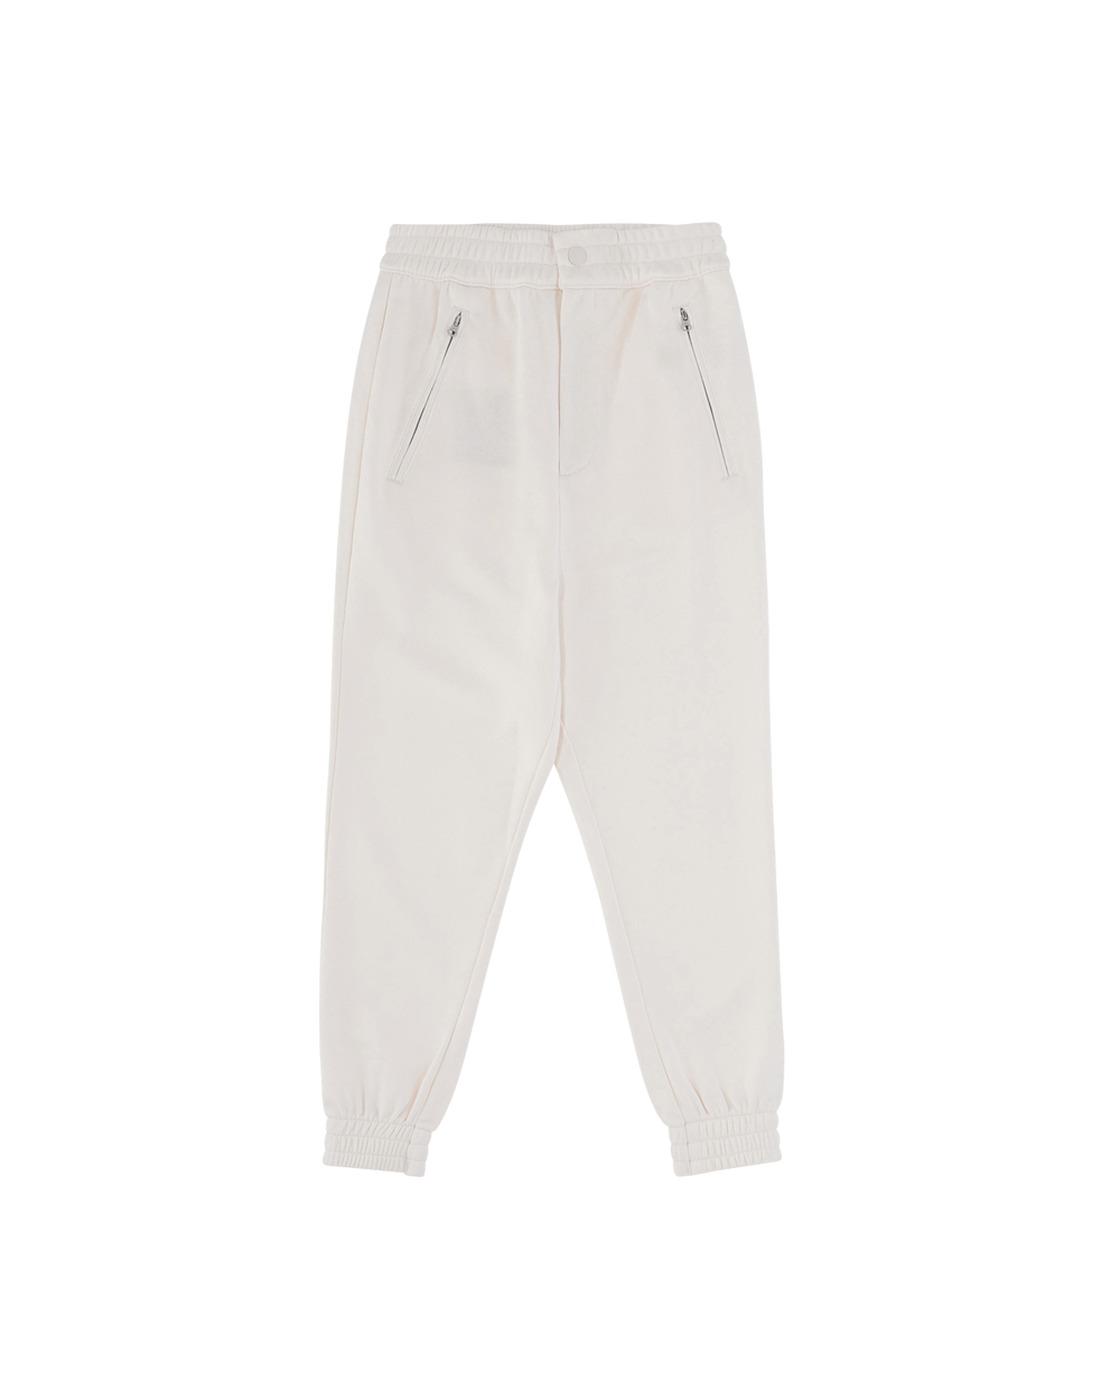 Adidas Originals Cuff Pants Chalk White